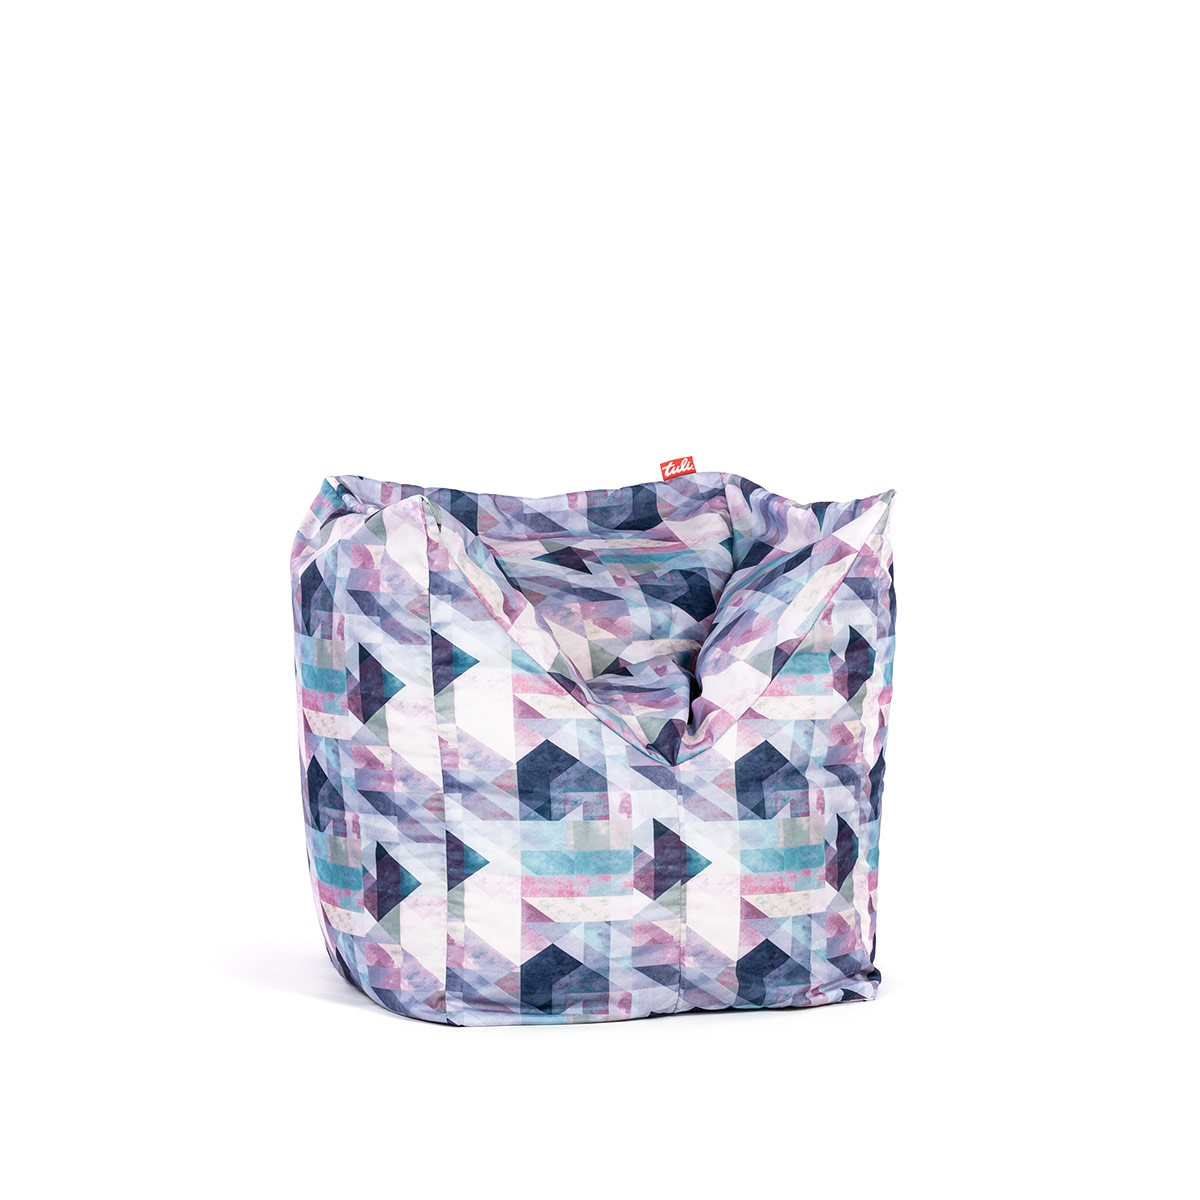 Tuli 3Color Snímateľný poťah - Polyester Vzor Pastel